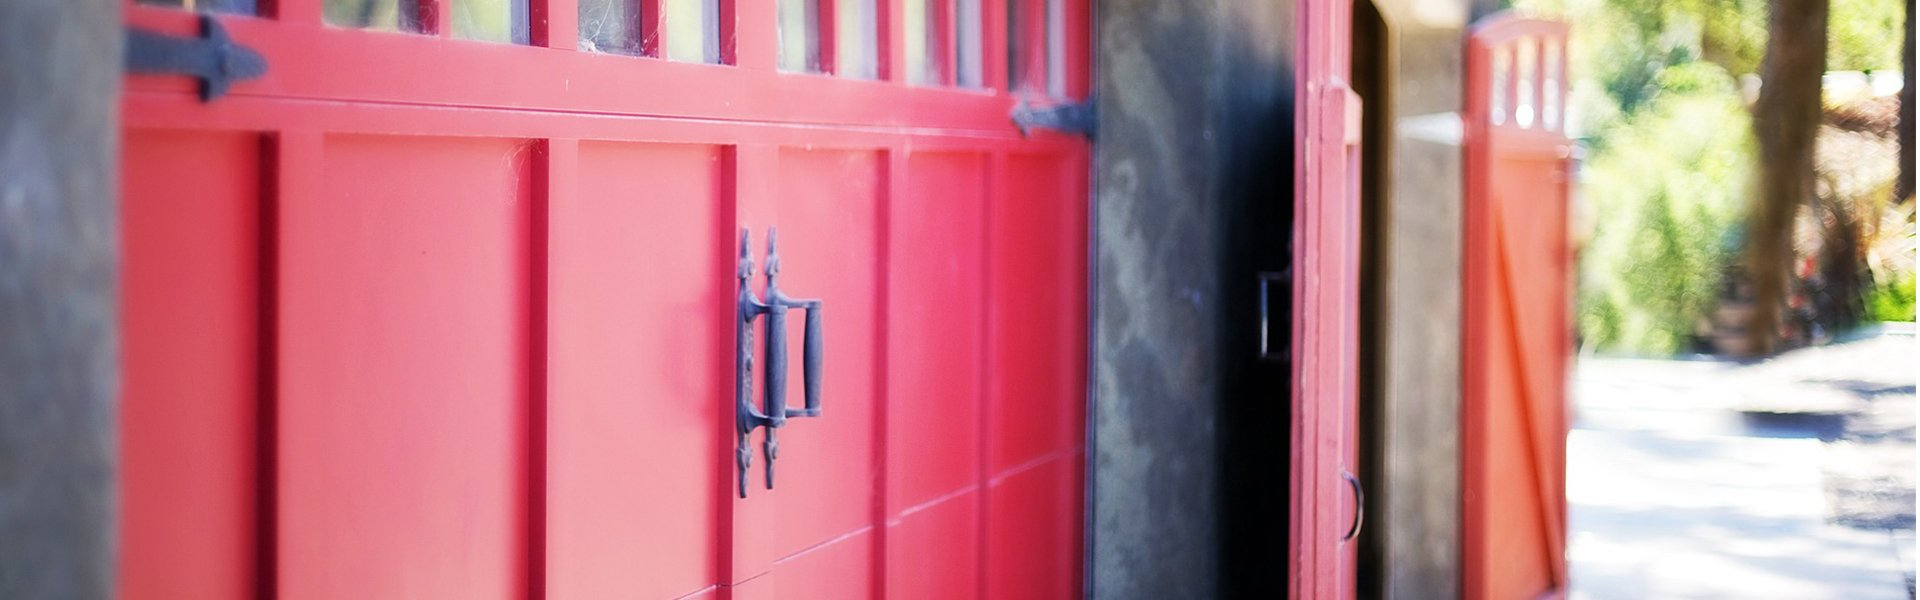 Reliable Garage Door Services MD